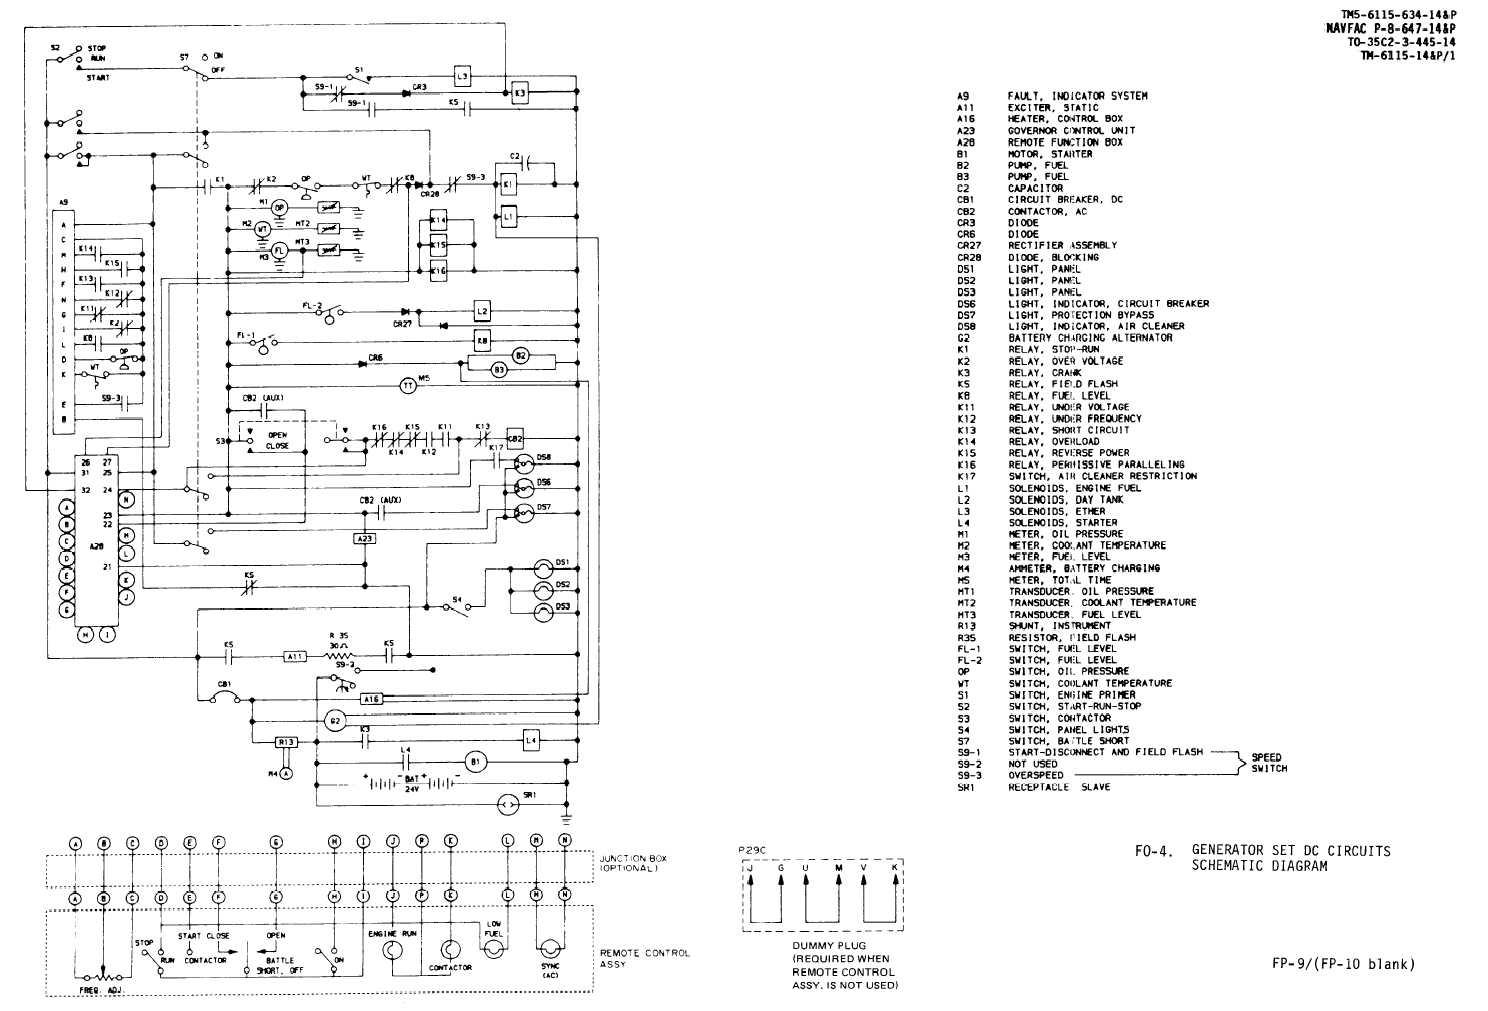 Fo 4 Generator Set Dc Circuits Schematic Diagram